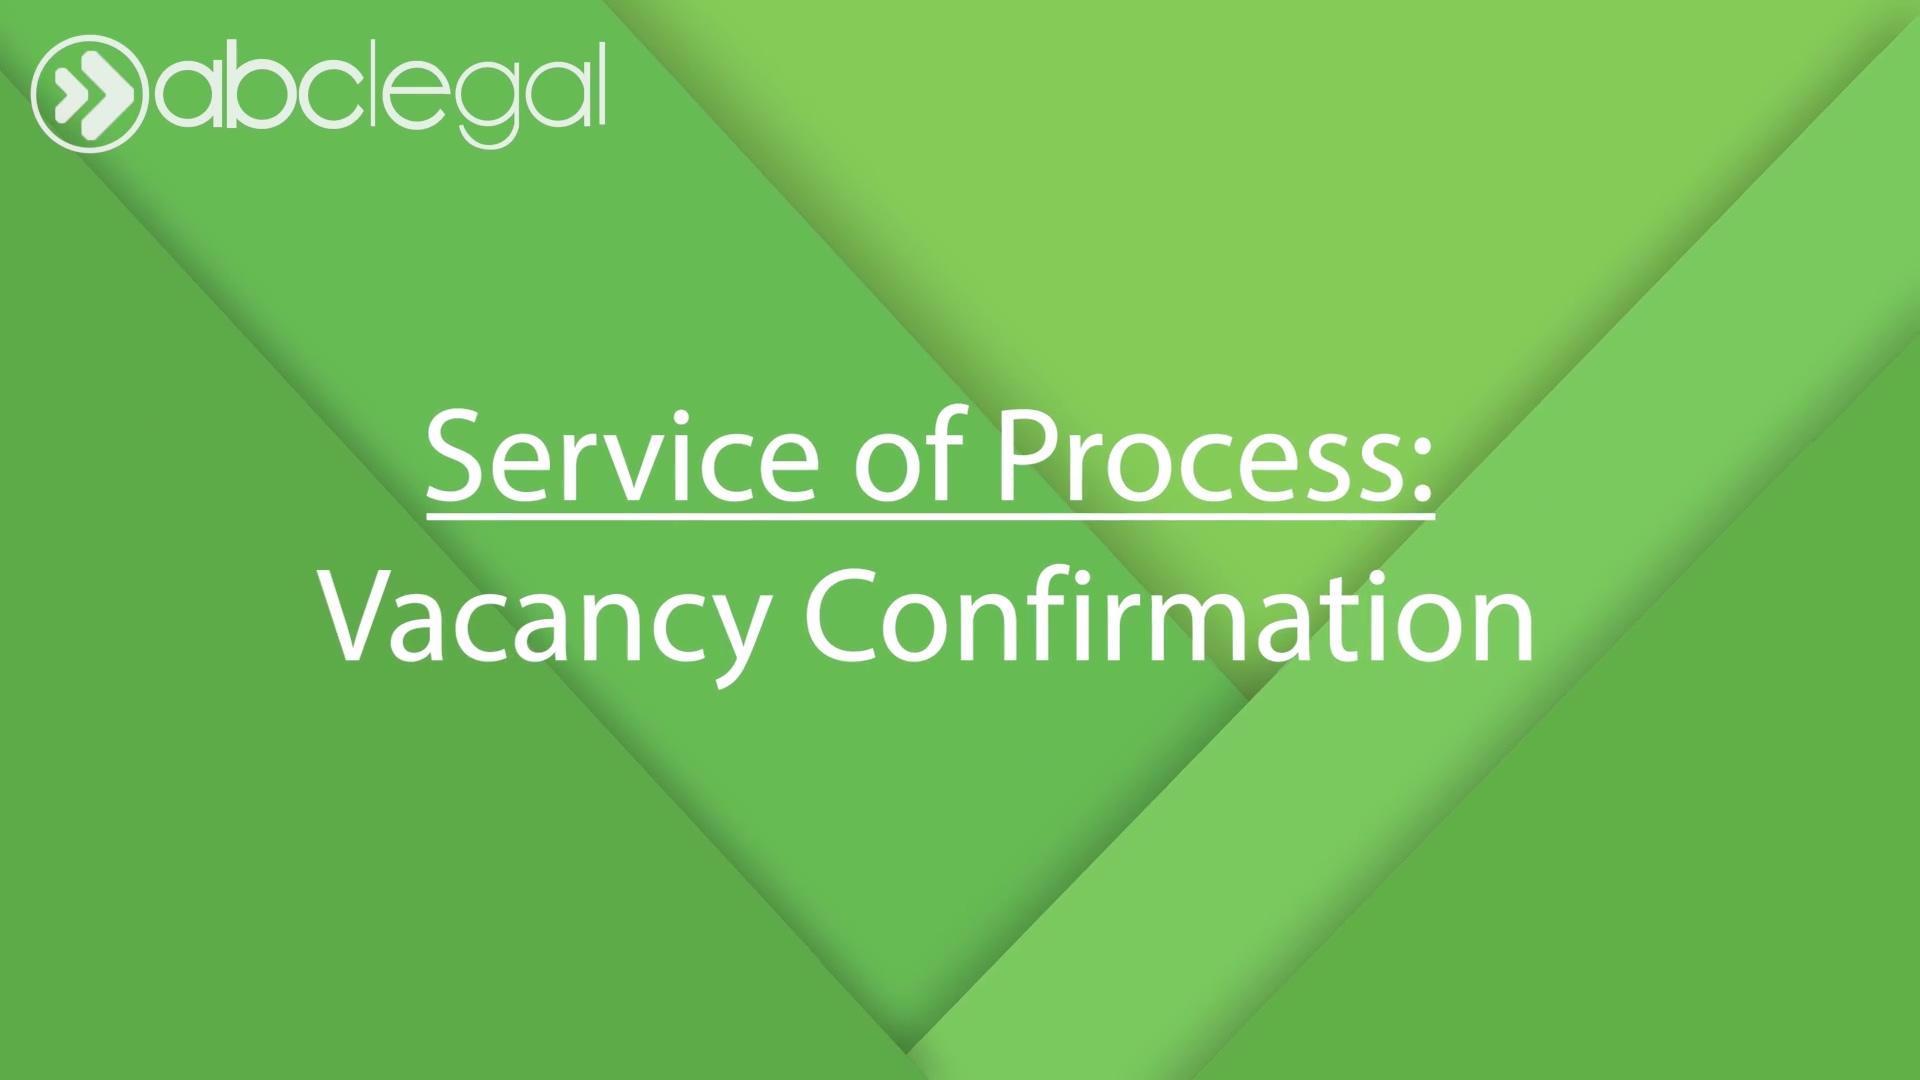 Vacancy Confirmation Final Cut 2